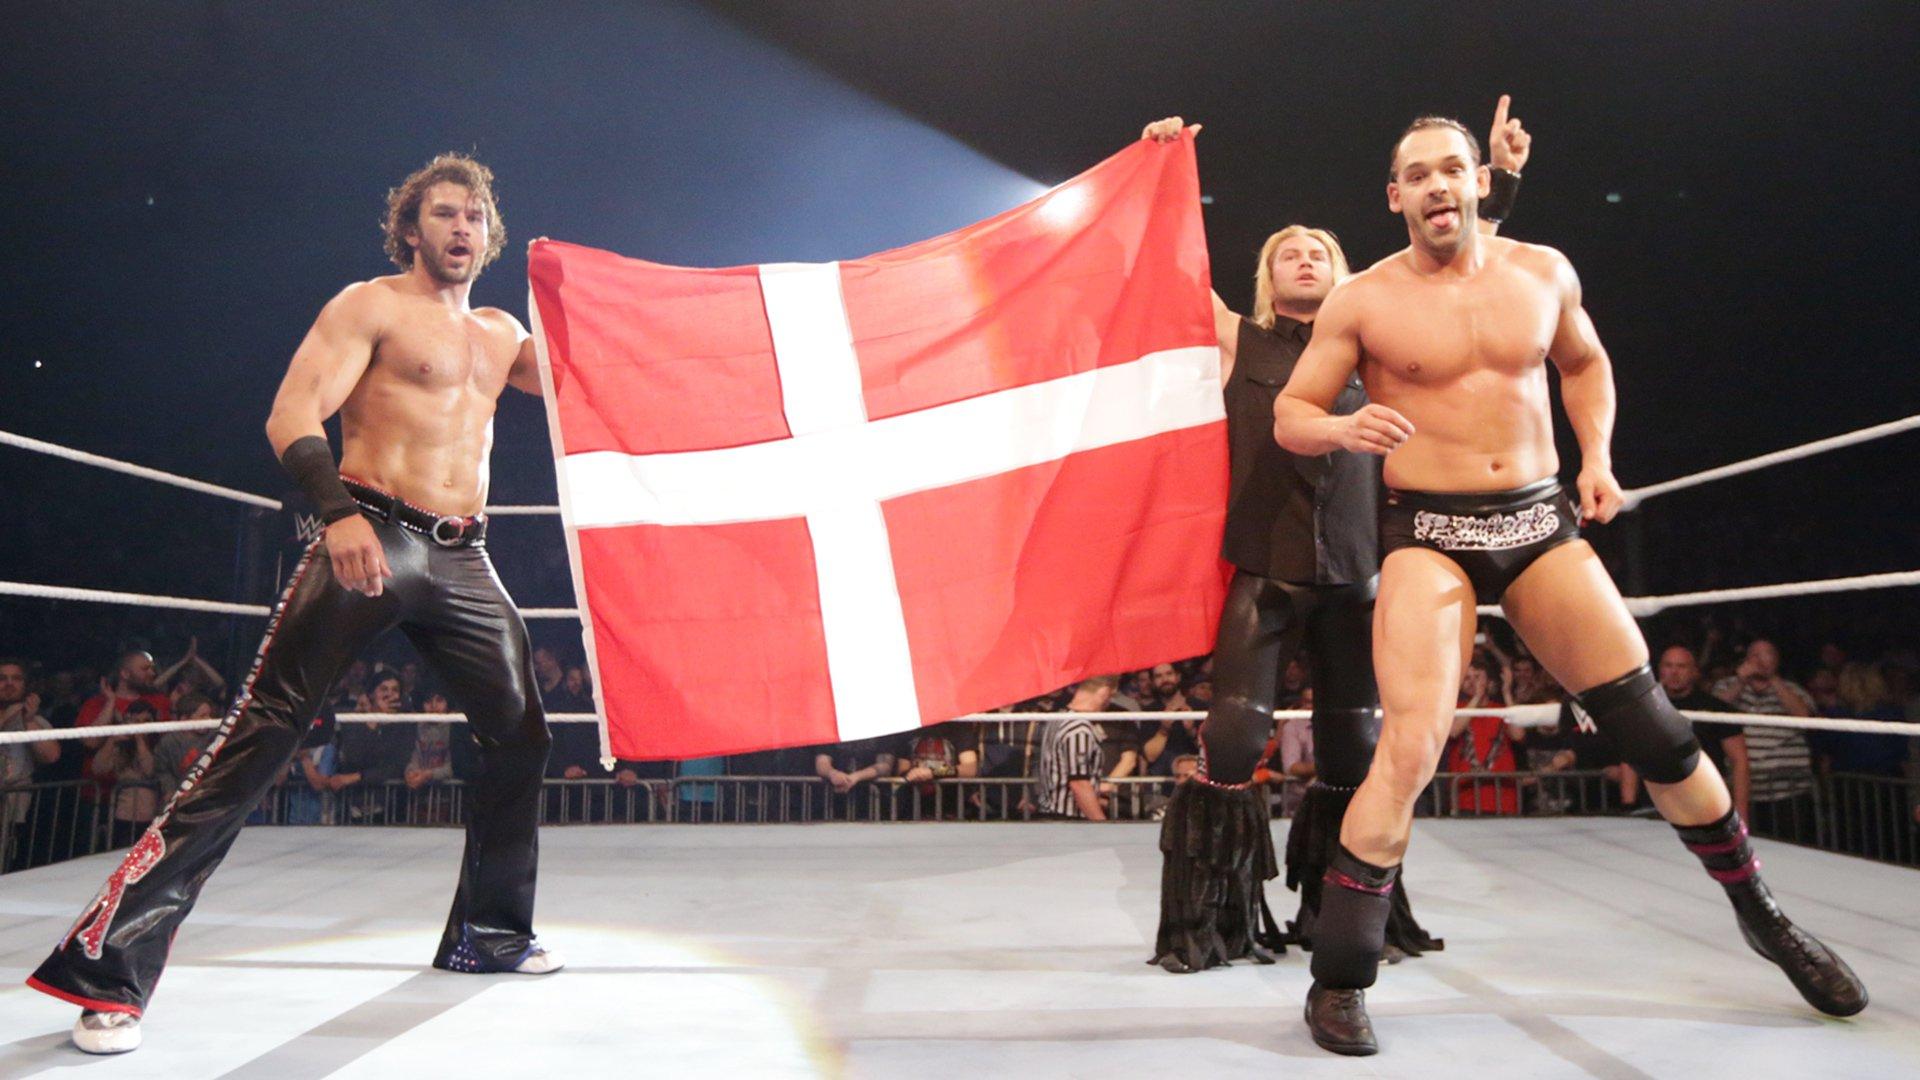 WWE Live comes to Copenhagen, Denmark: photos